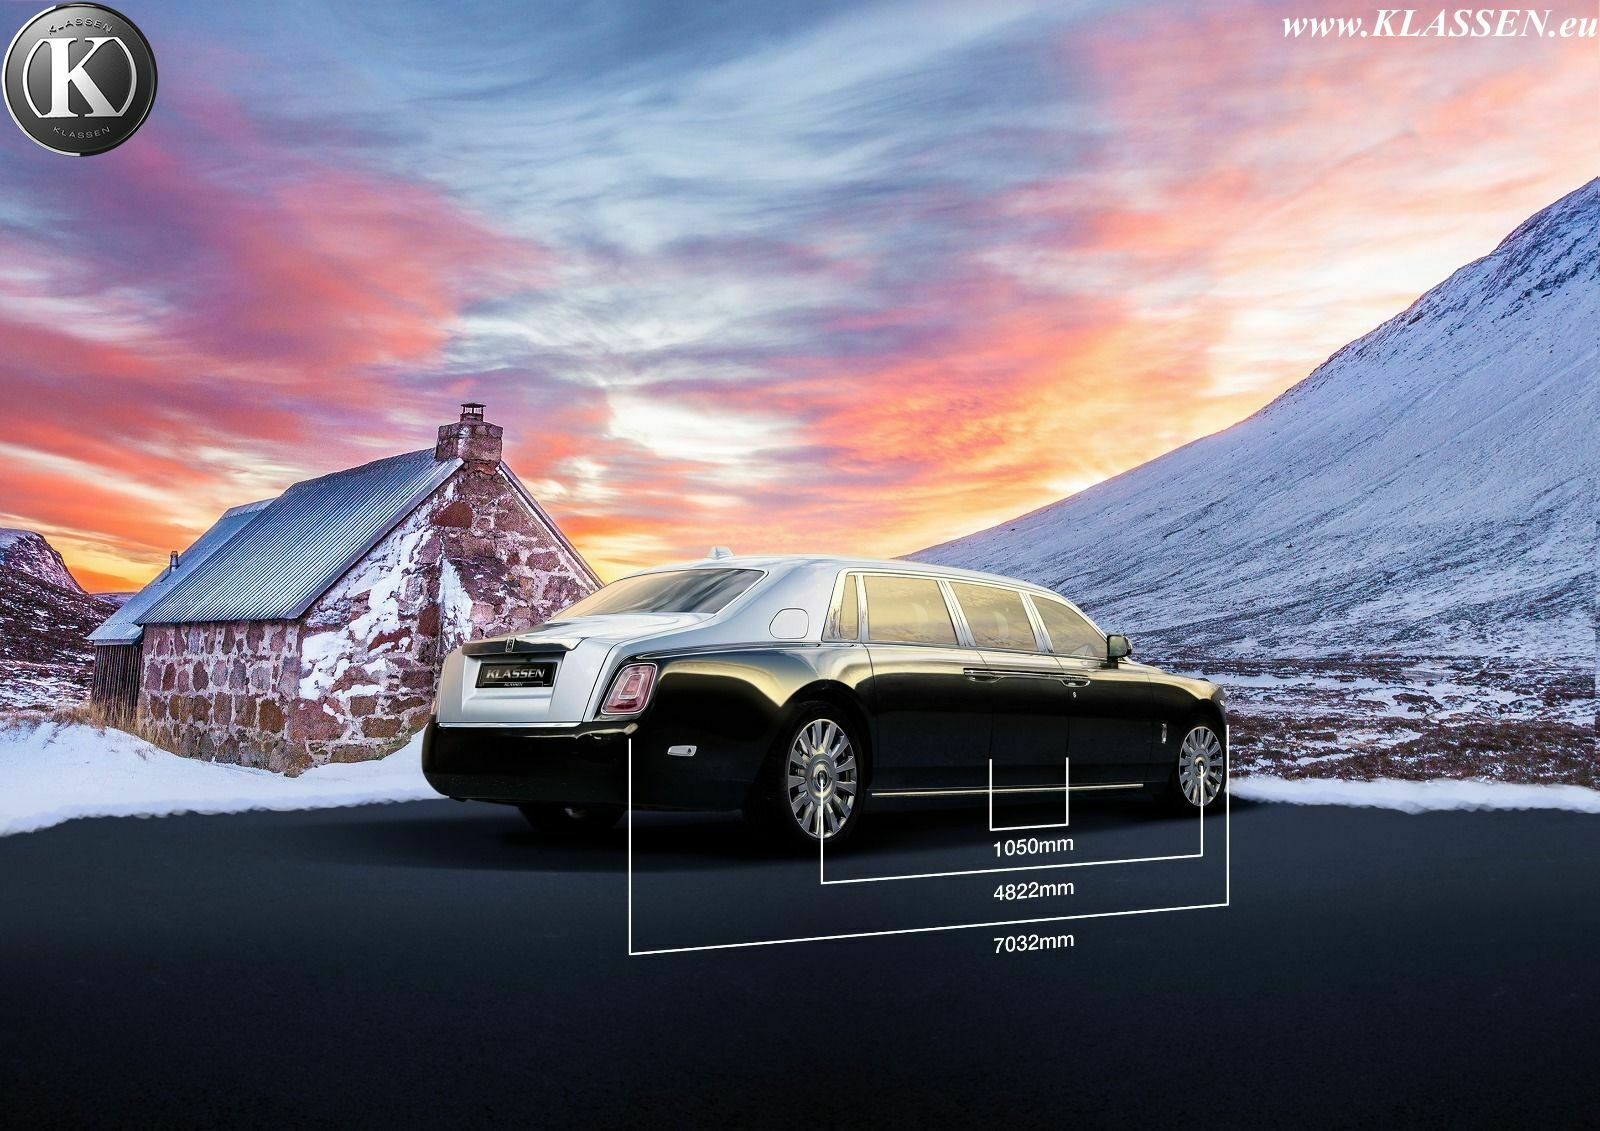 Rolls-Royce-Phantom-by-Klassen-5